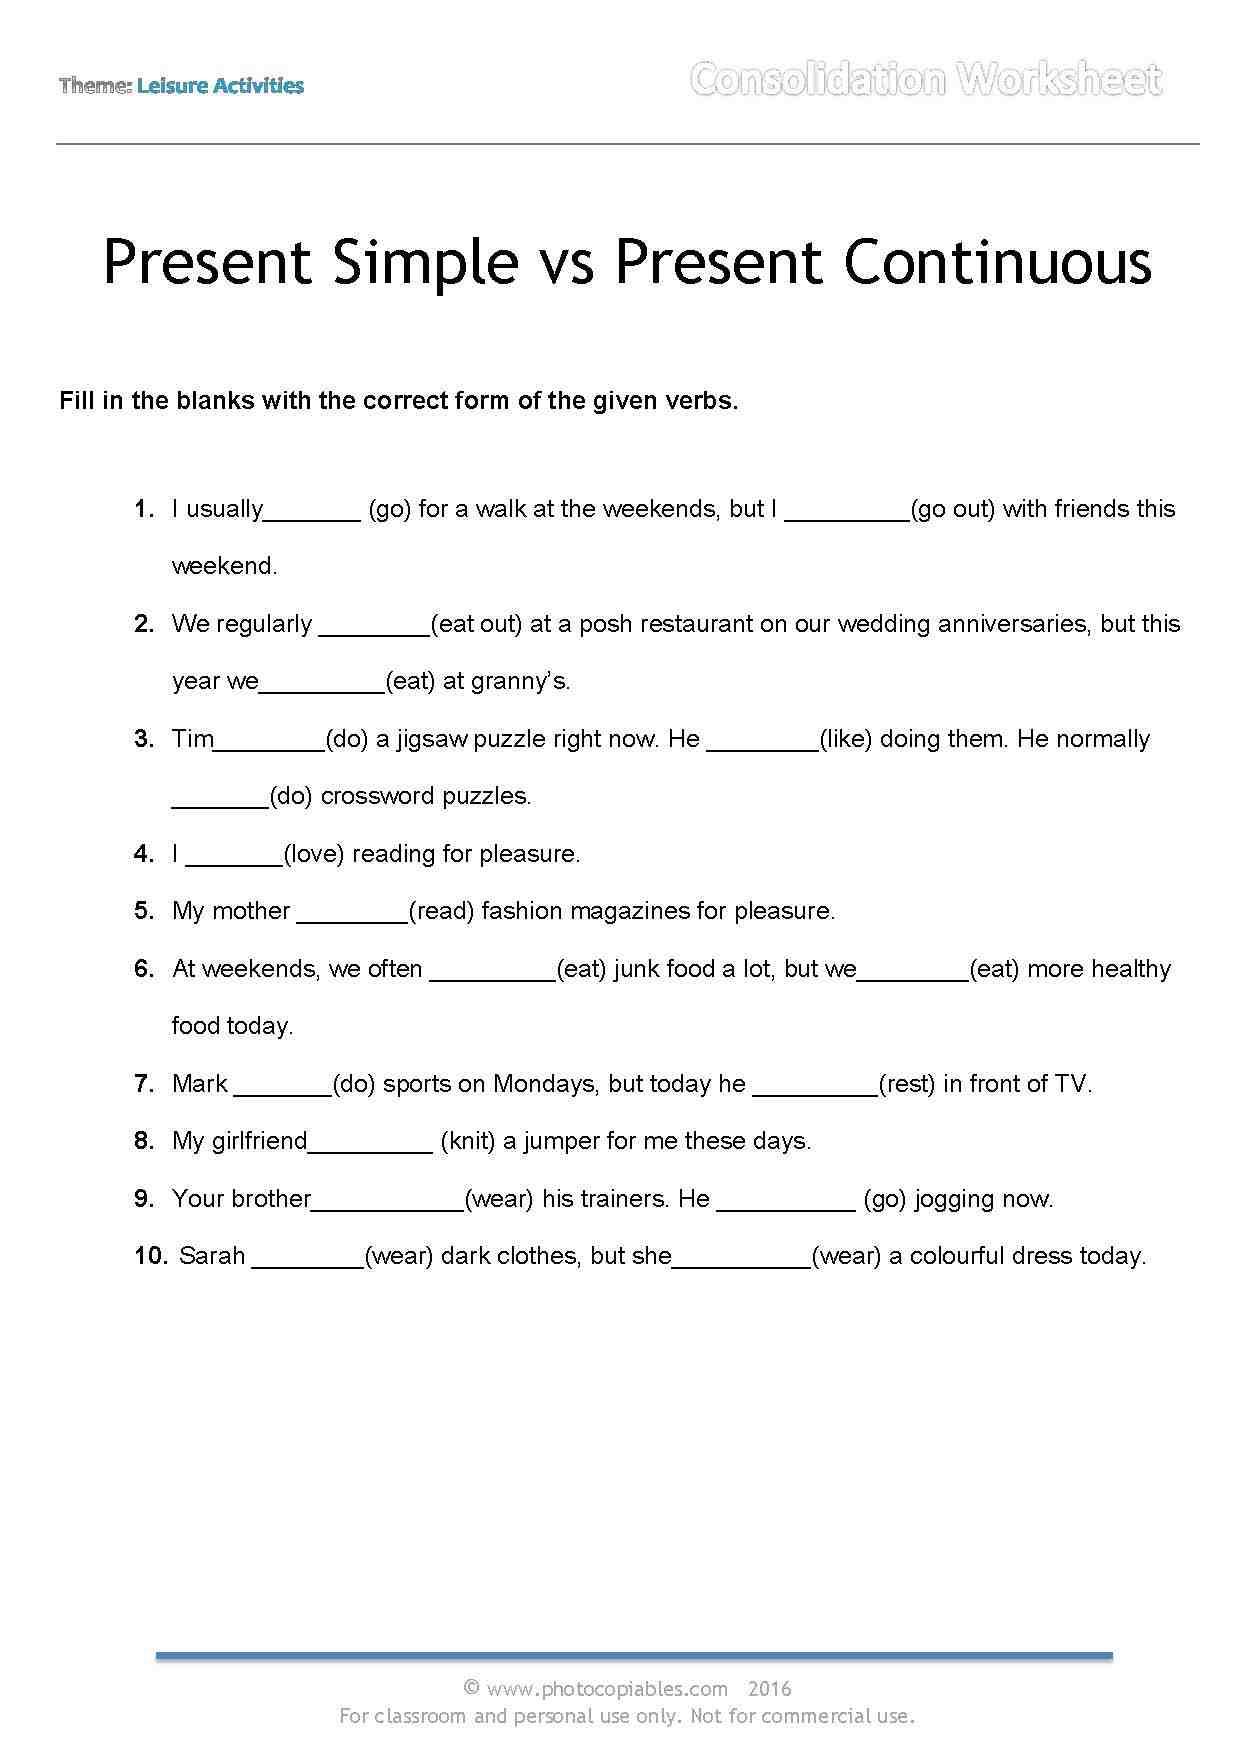 Online Exercises Present Simple Vs Present Continuous